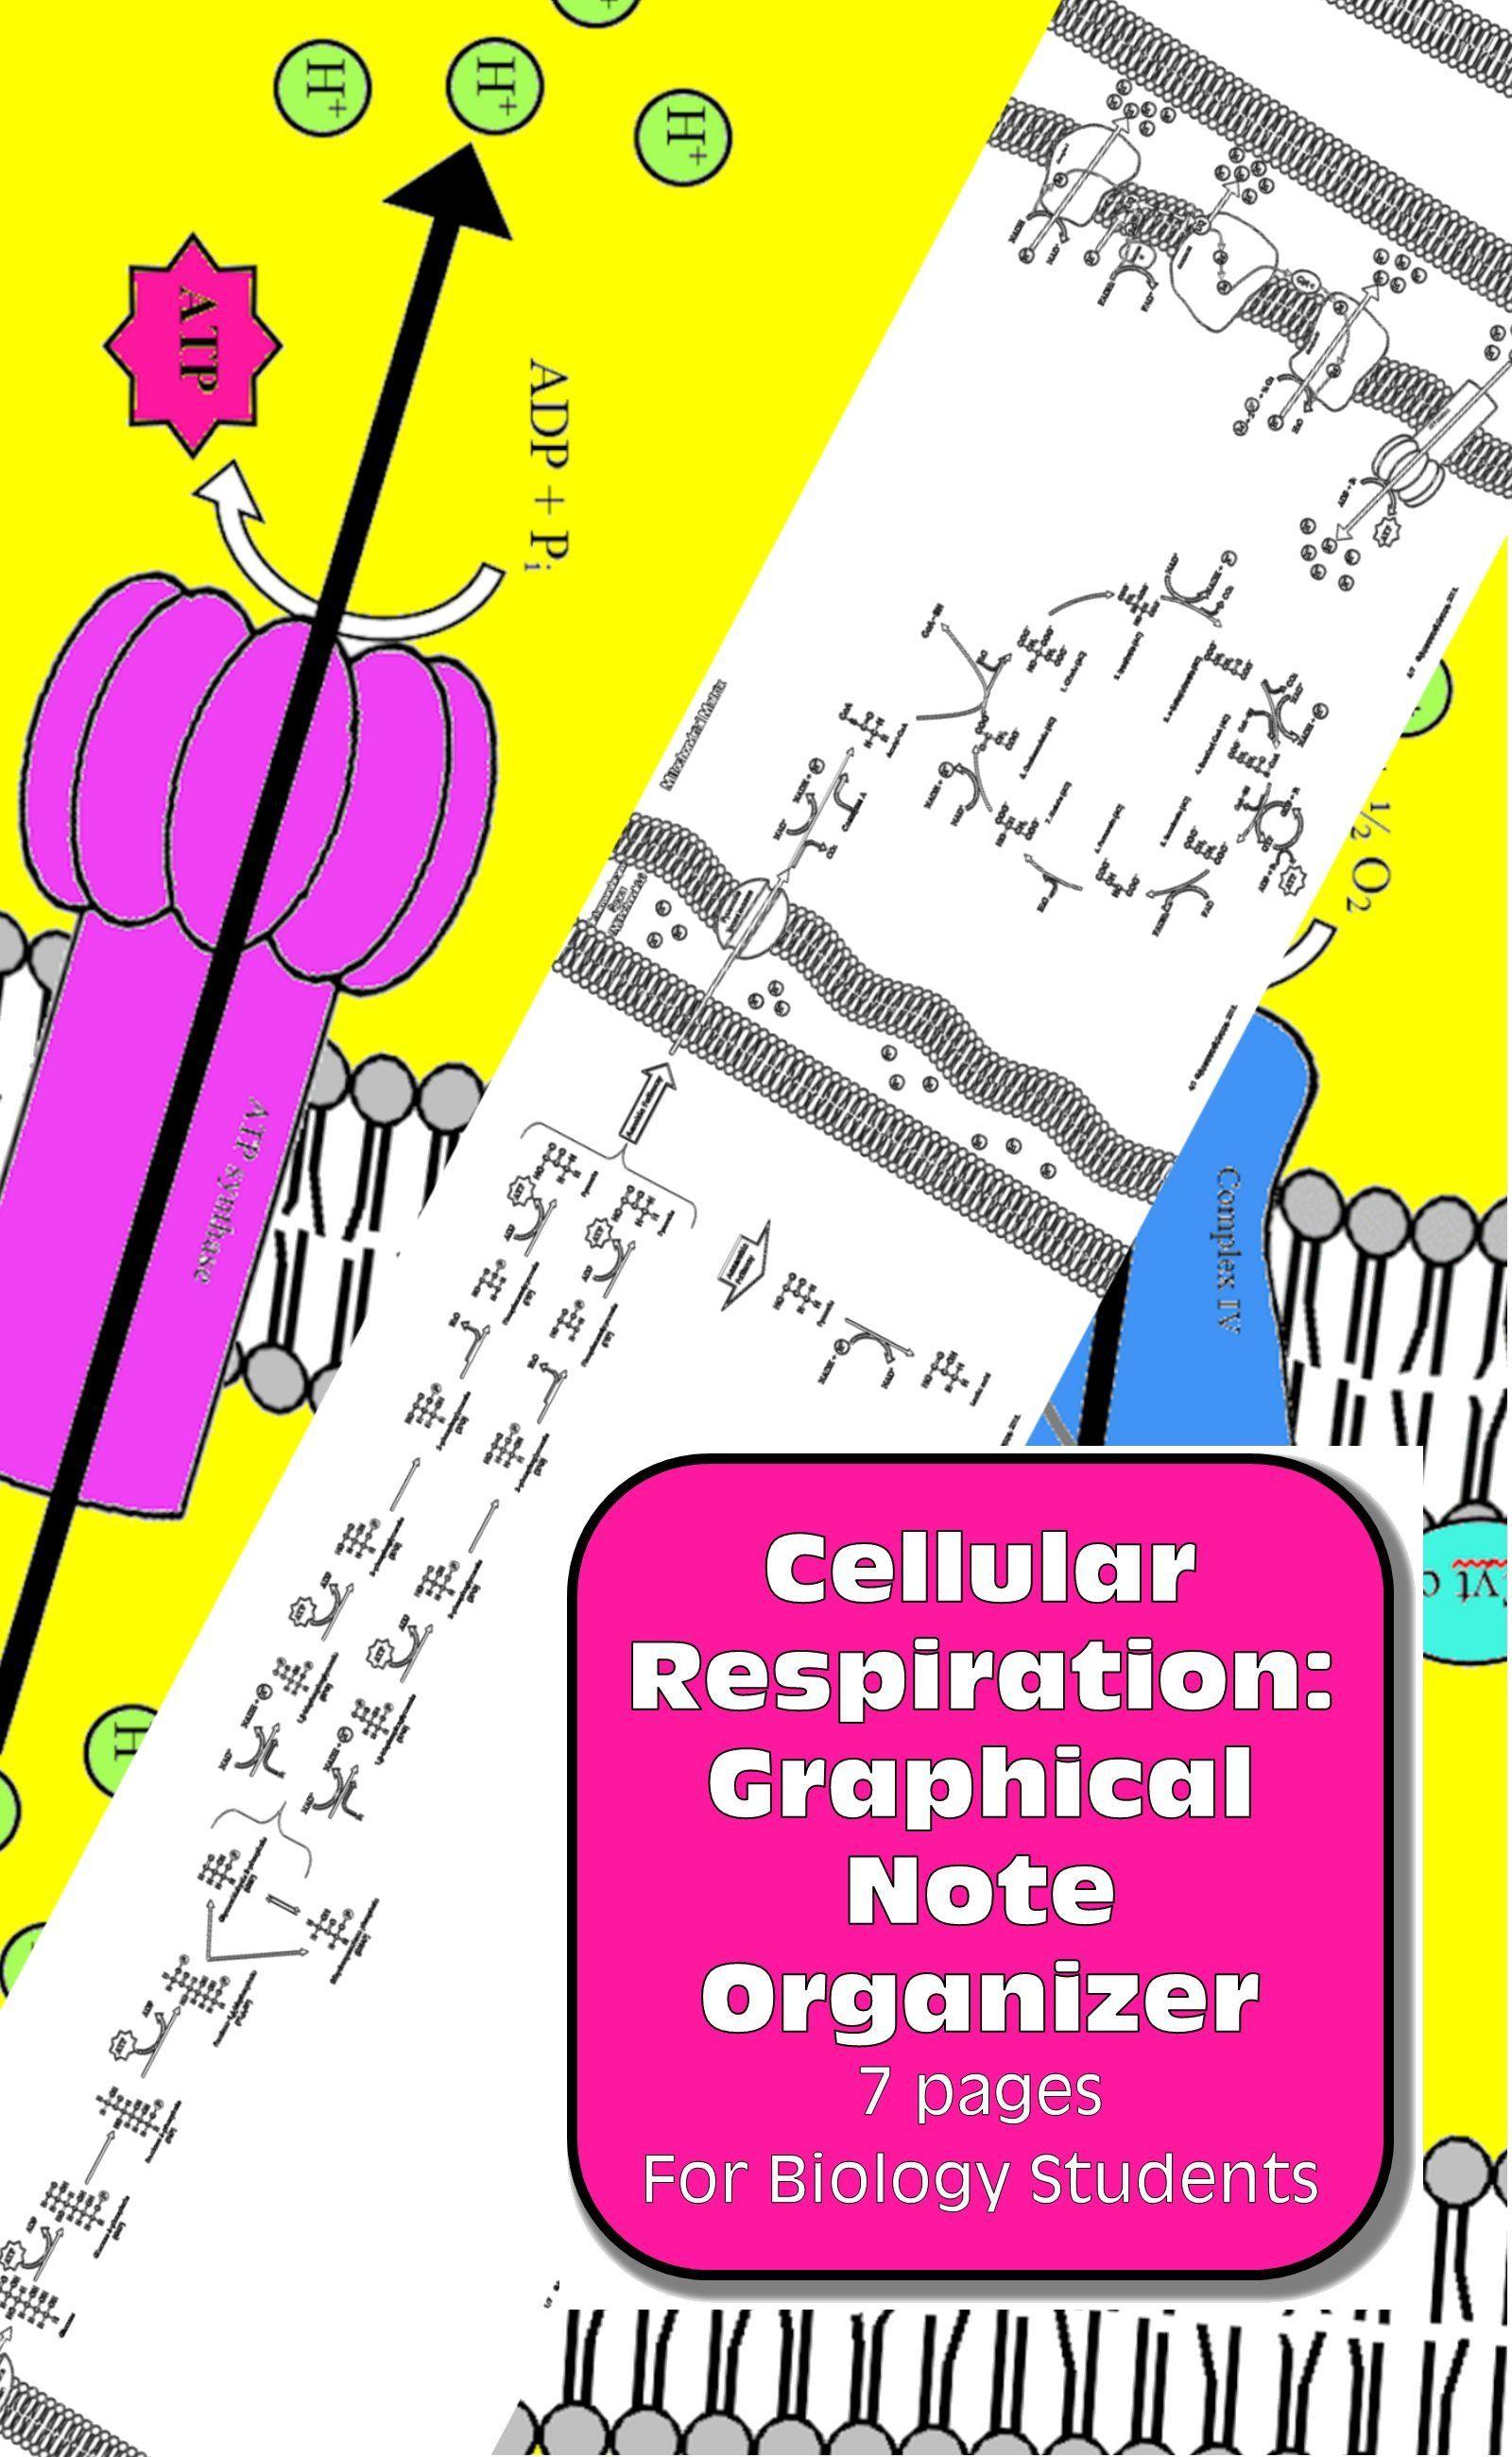 Cellular Respiration Diagram Amp Graphic Note Organizer For